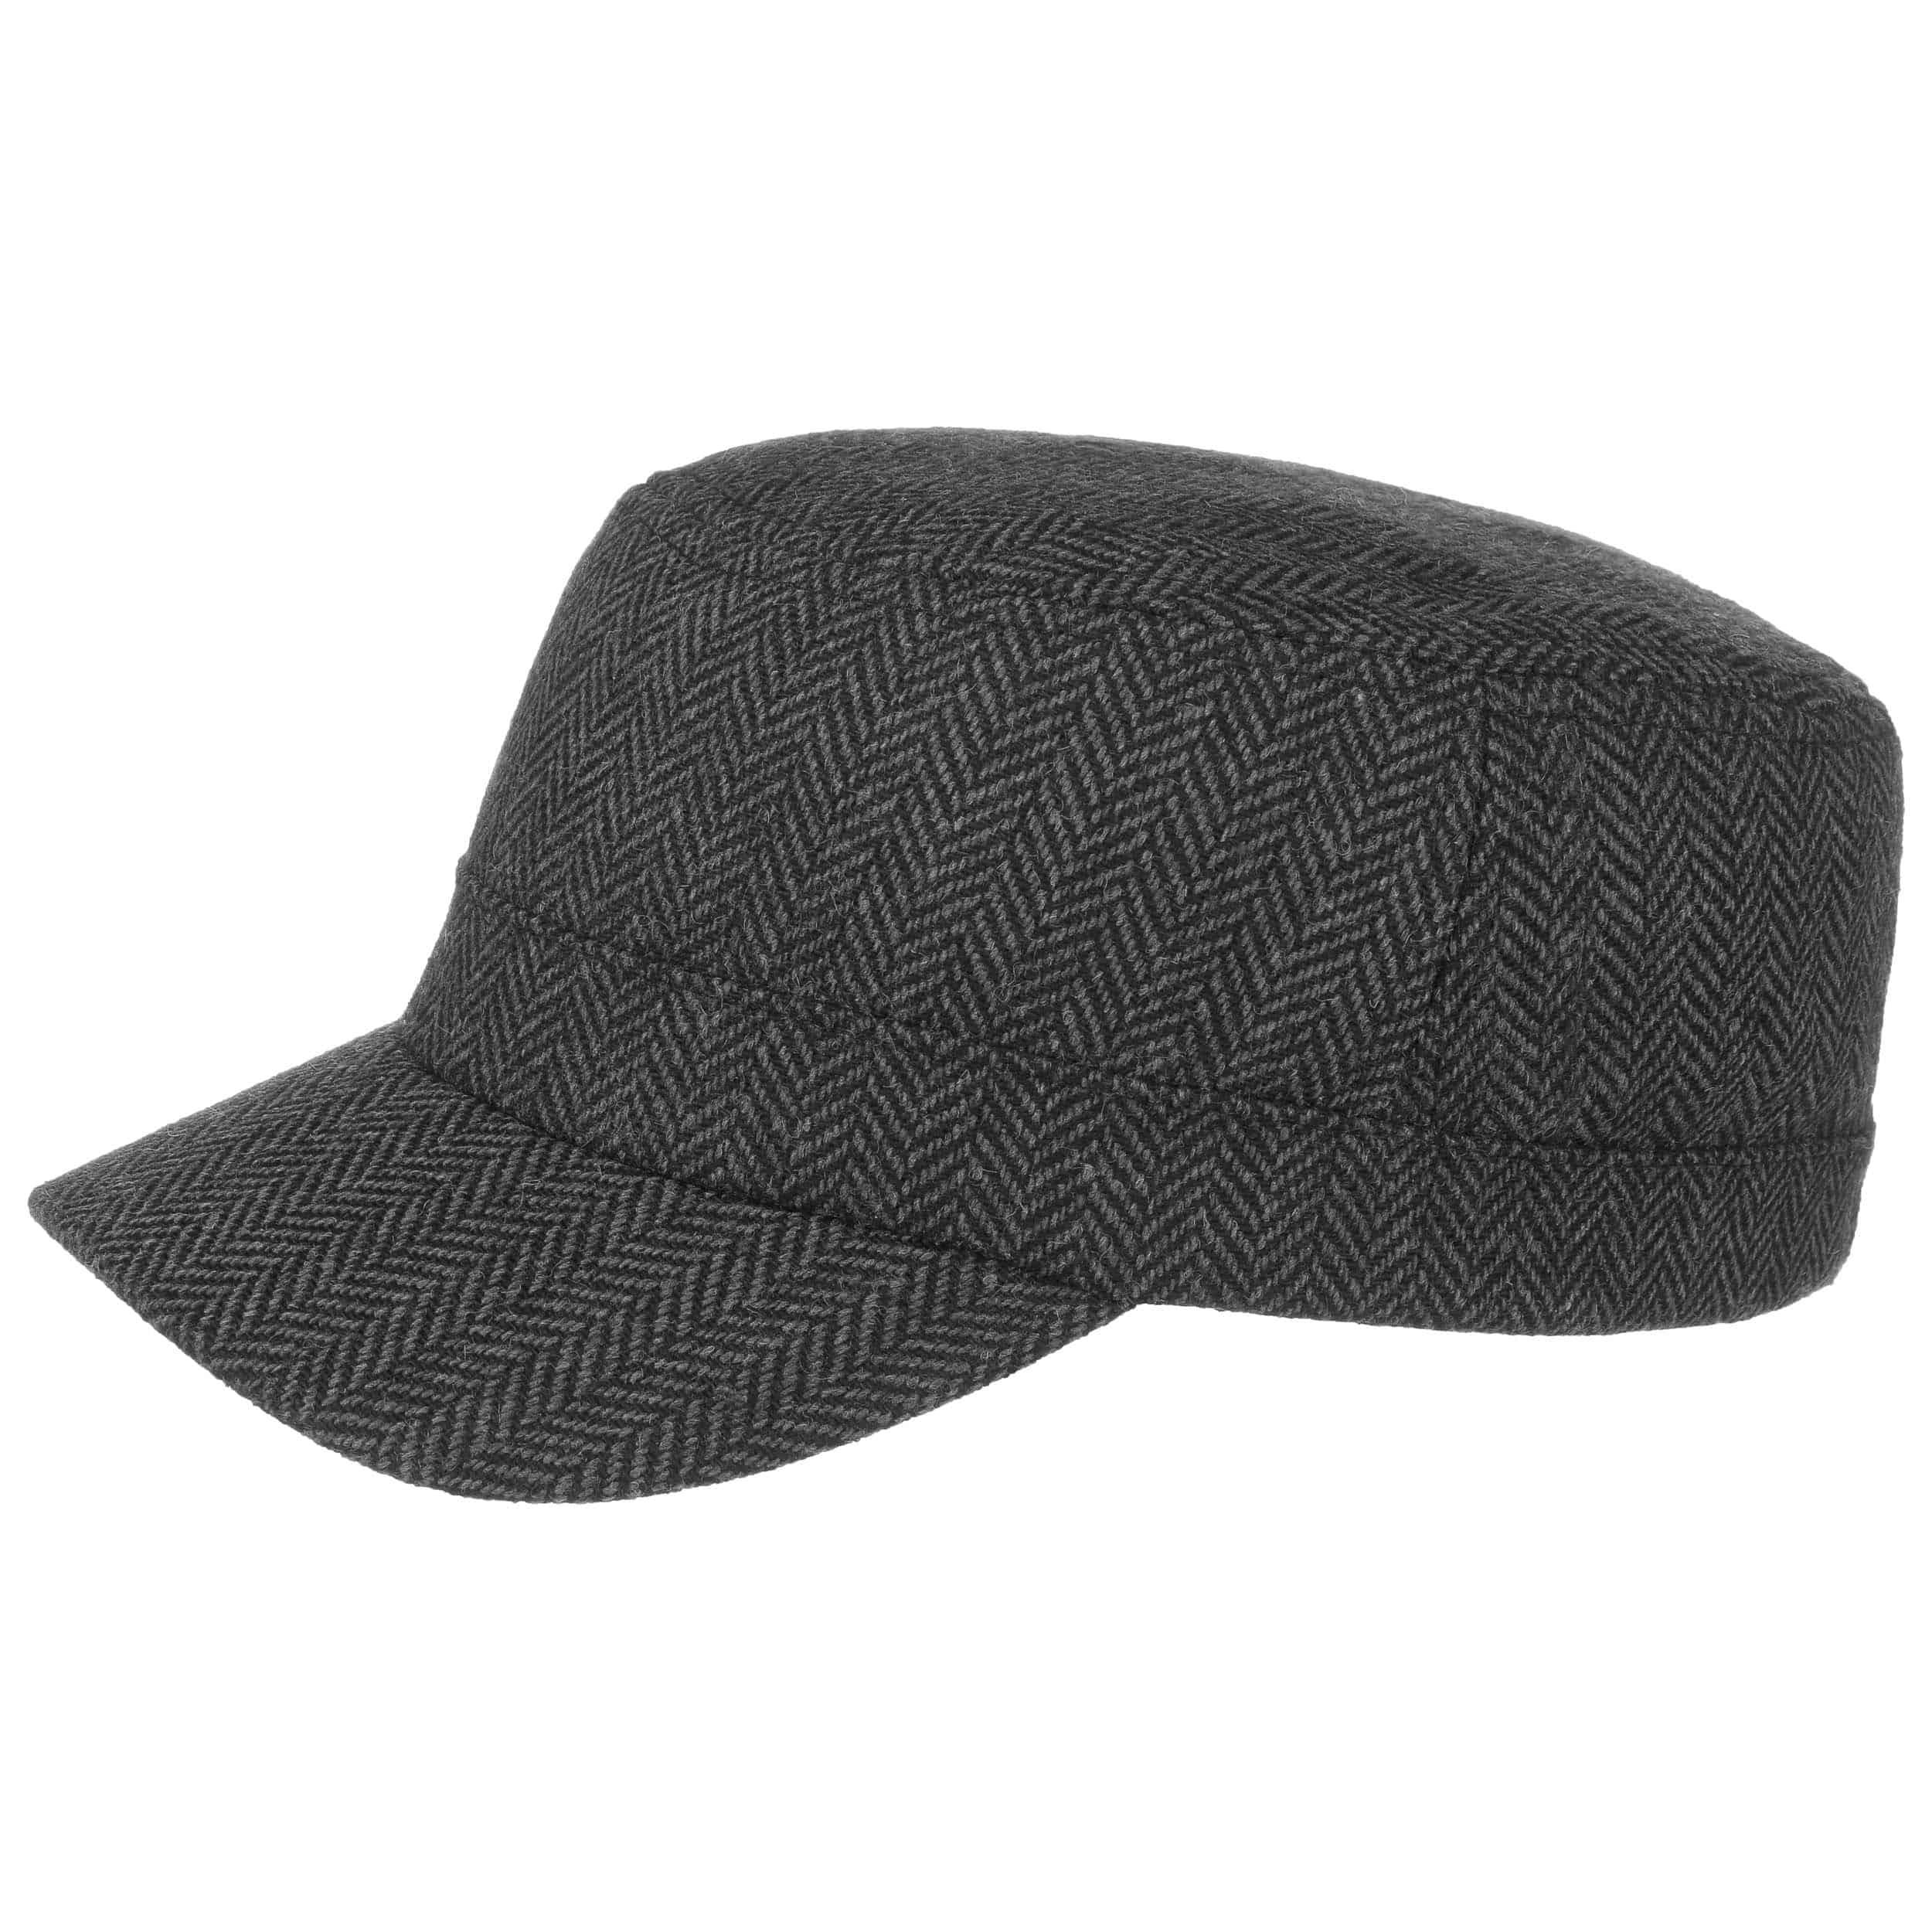 Gorra Militar Herringbone by Lipodo - Gorras - sombreroshop.es 46dabf0cc76